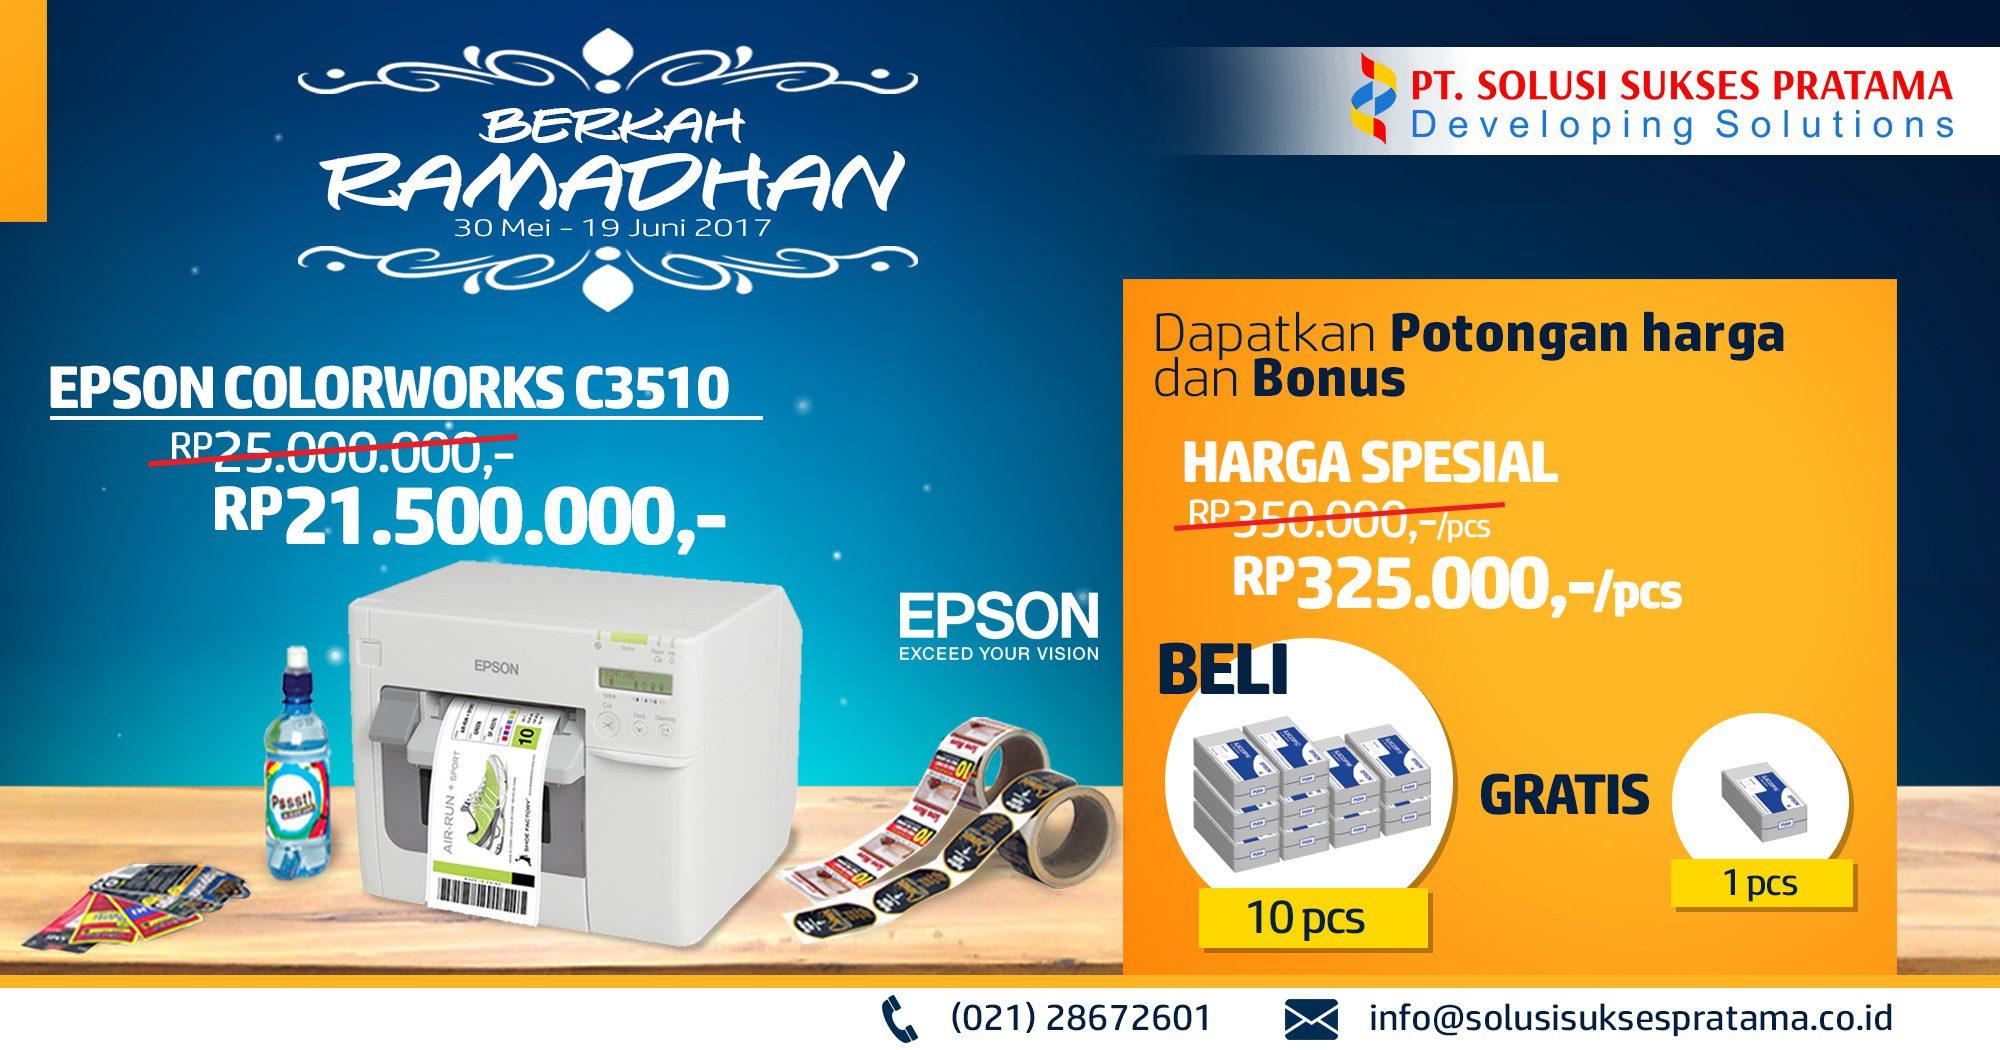 epson tm-c3510 printer label - promo ramadhan